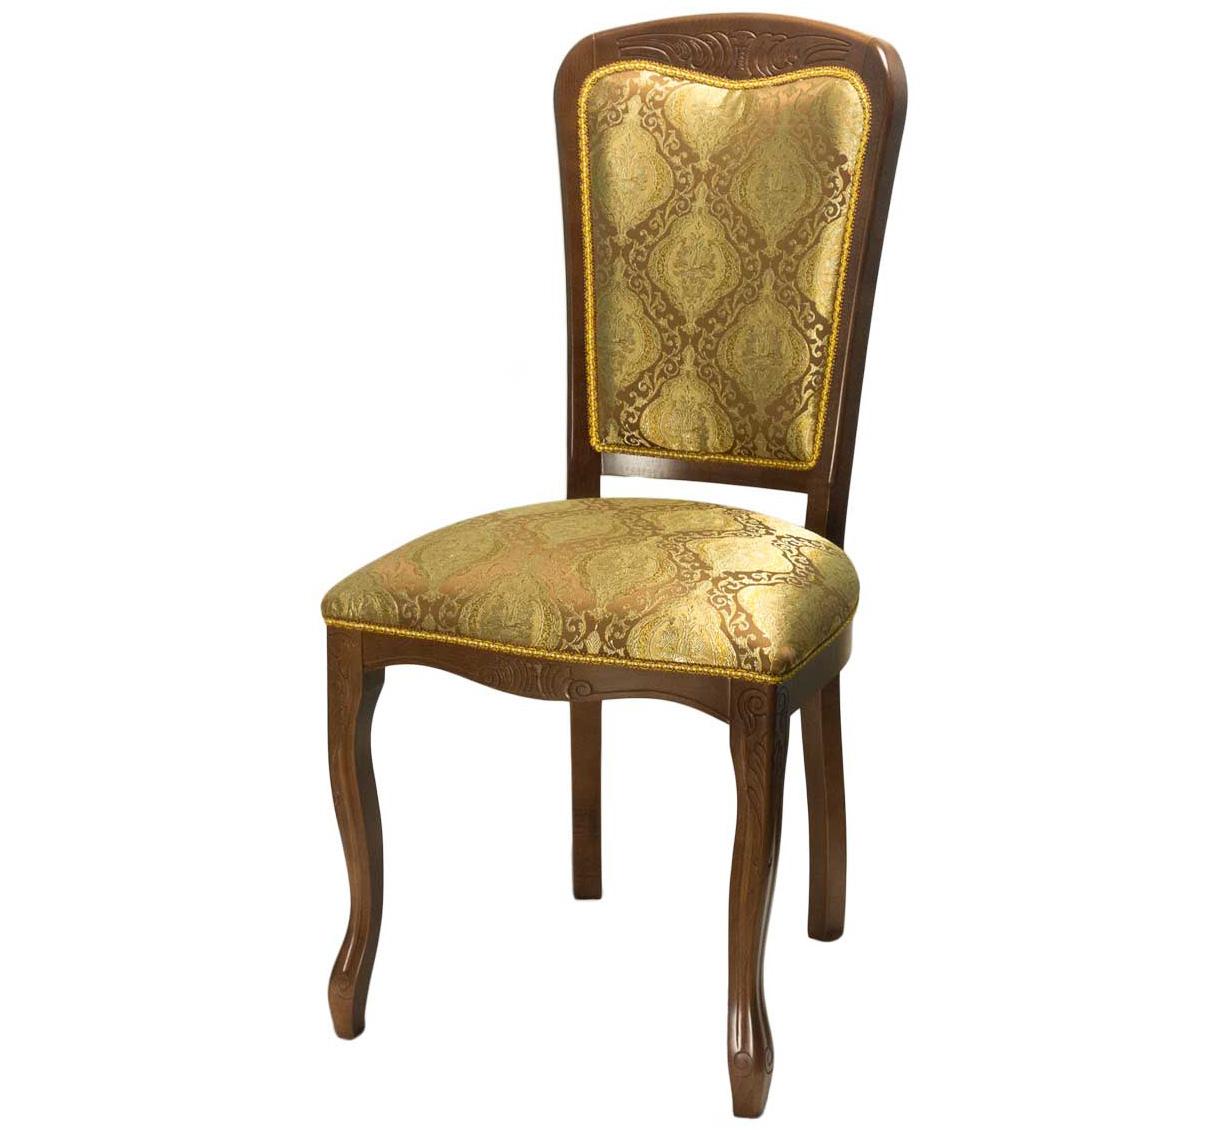 Стул деревянный орех ткань золото (арт. М3325)